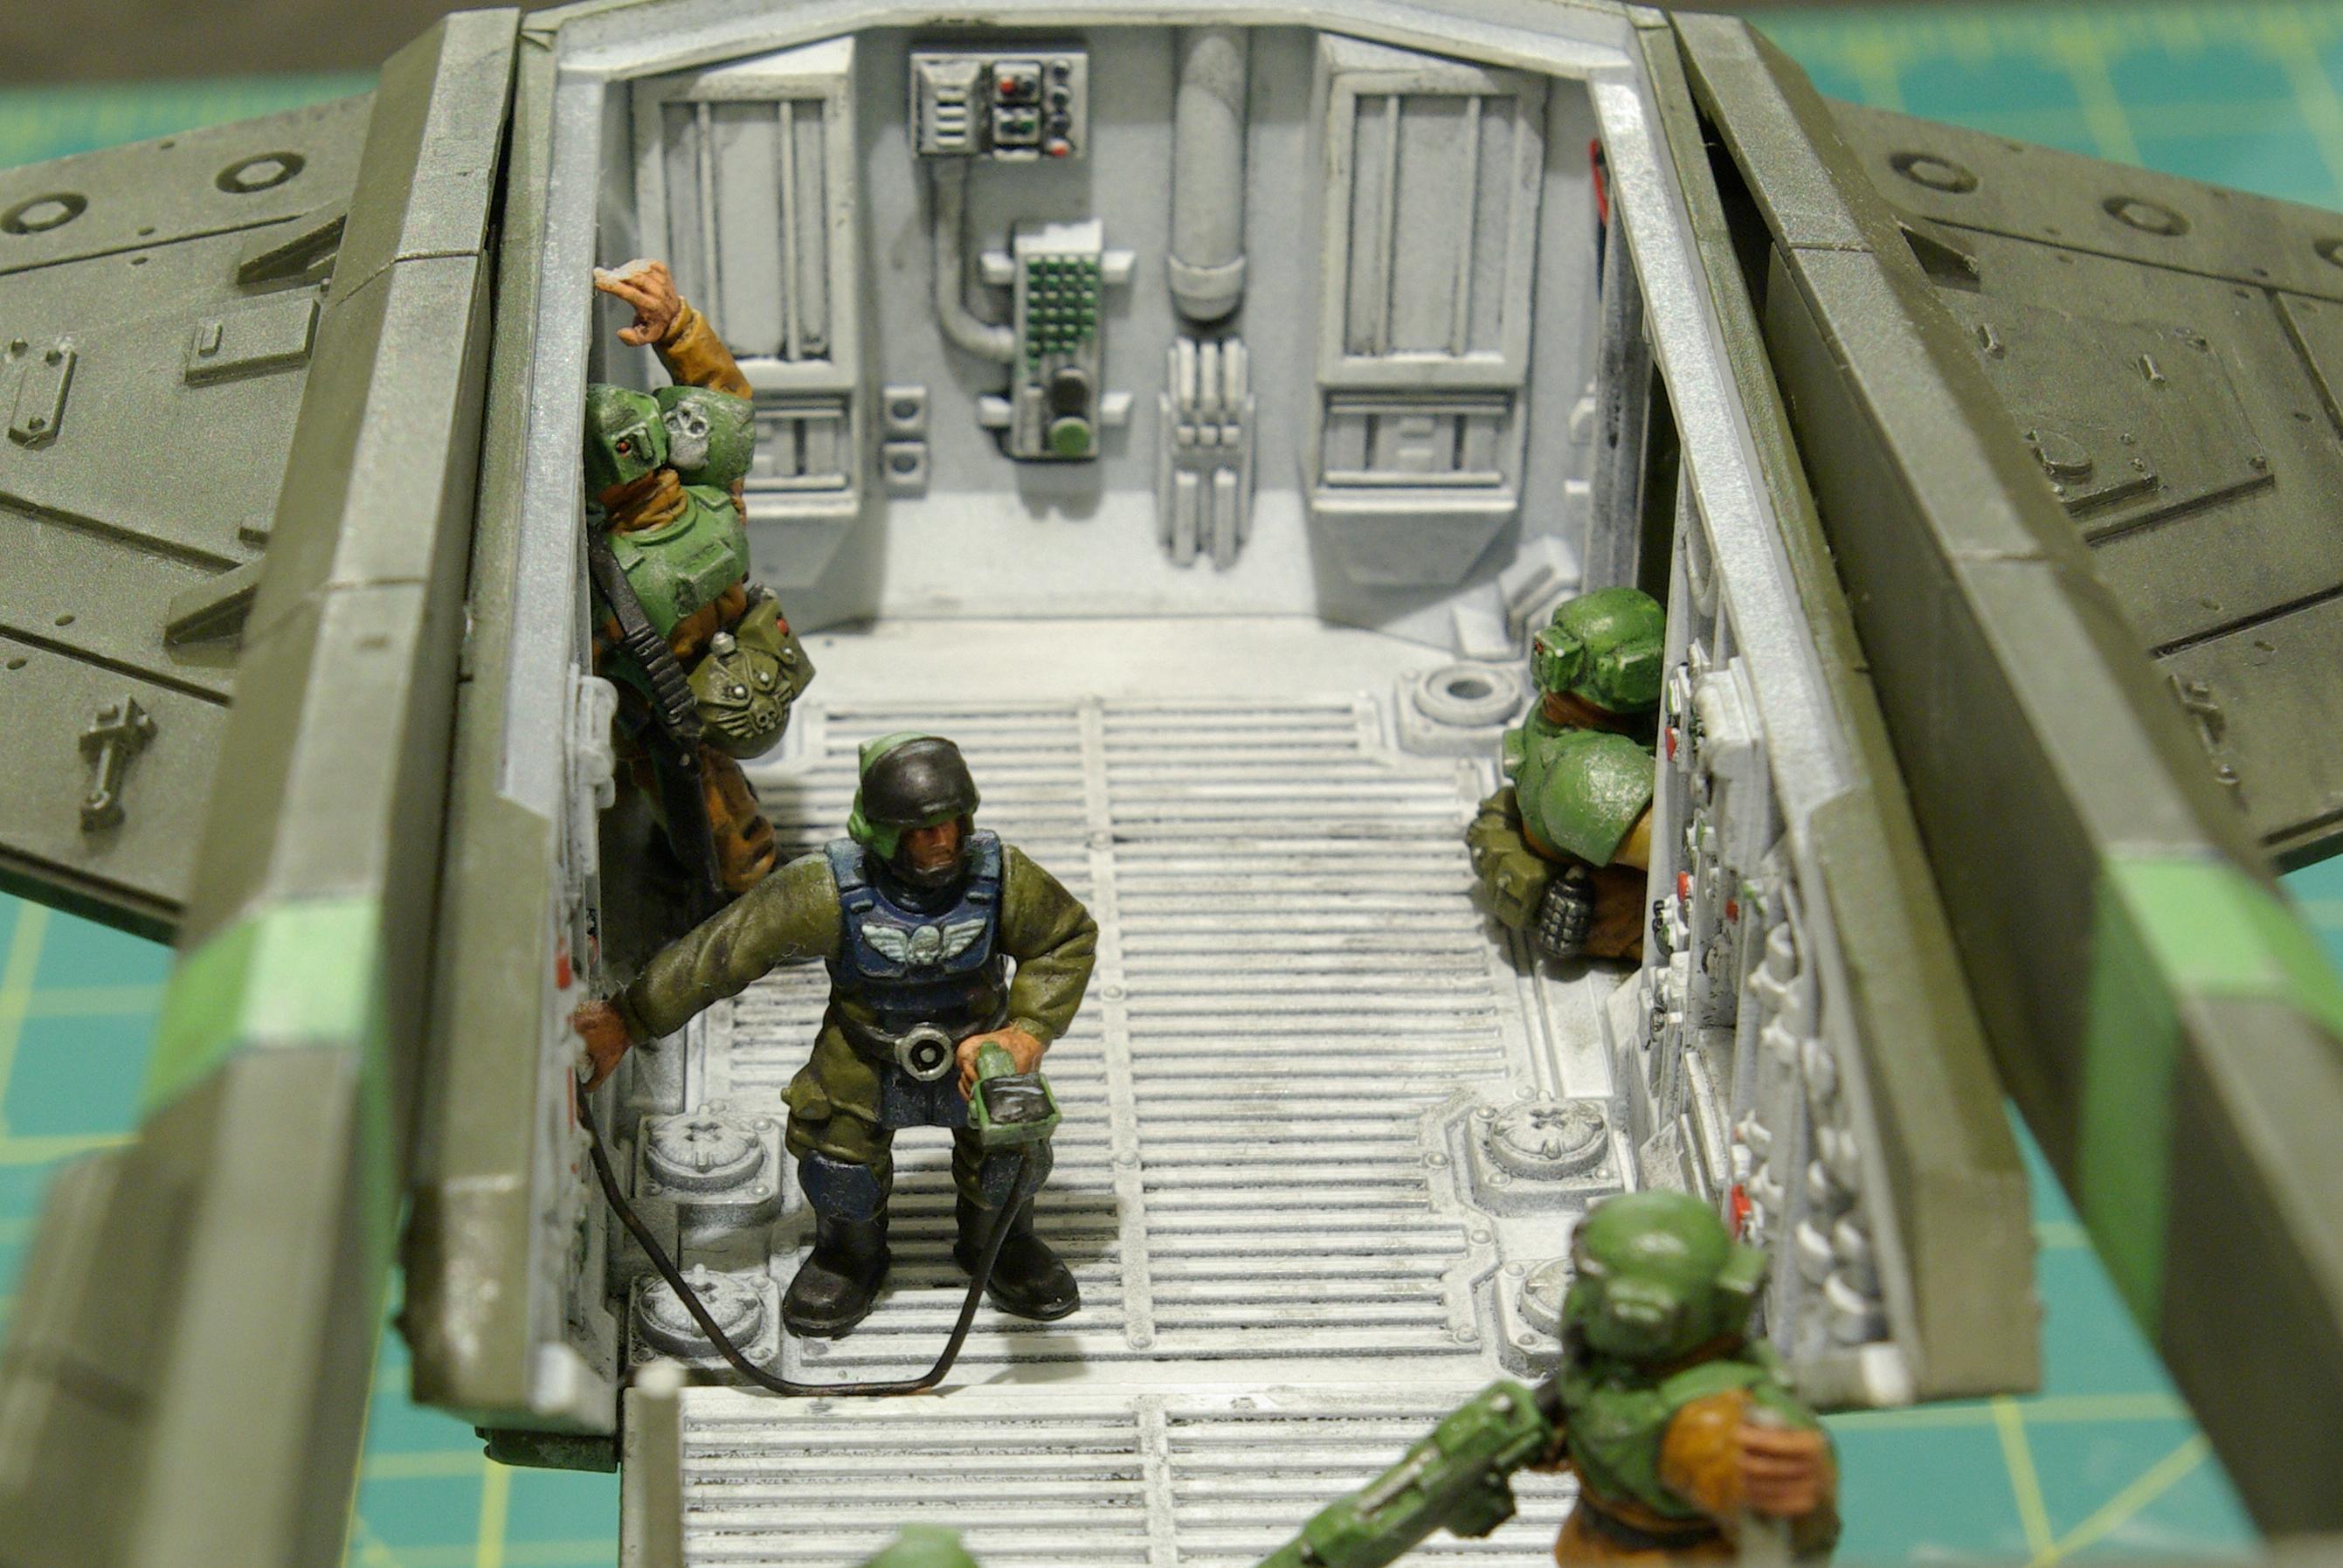 Imperial Guard, Interior, Valkyrie